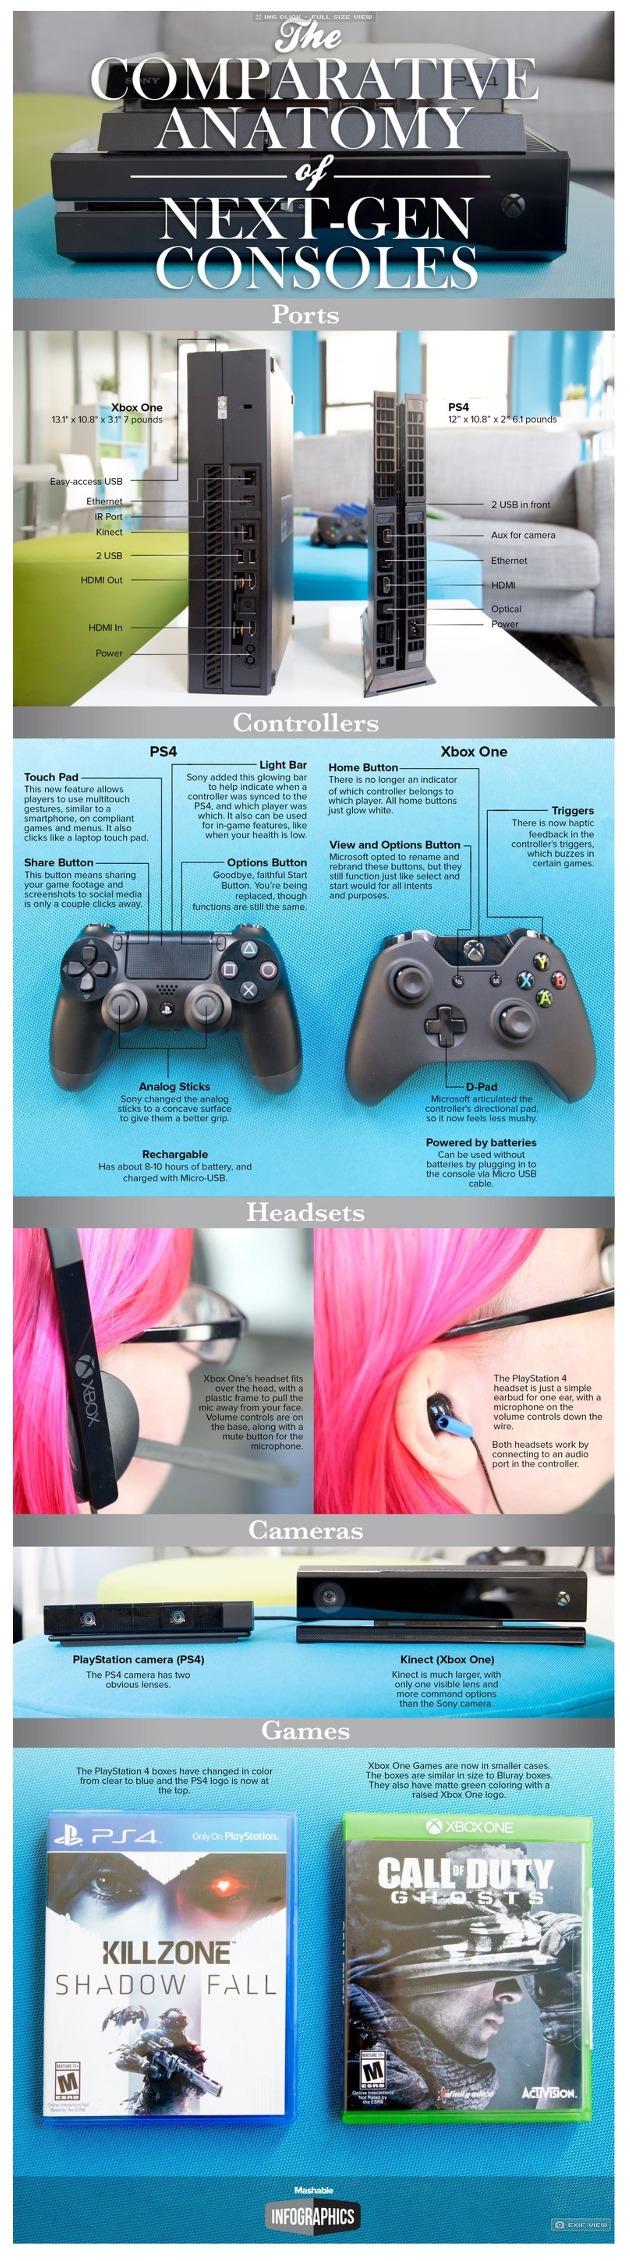 PS4 와 XBOX One 비교